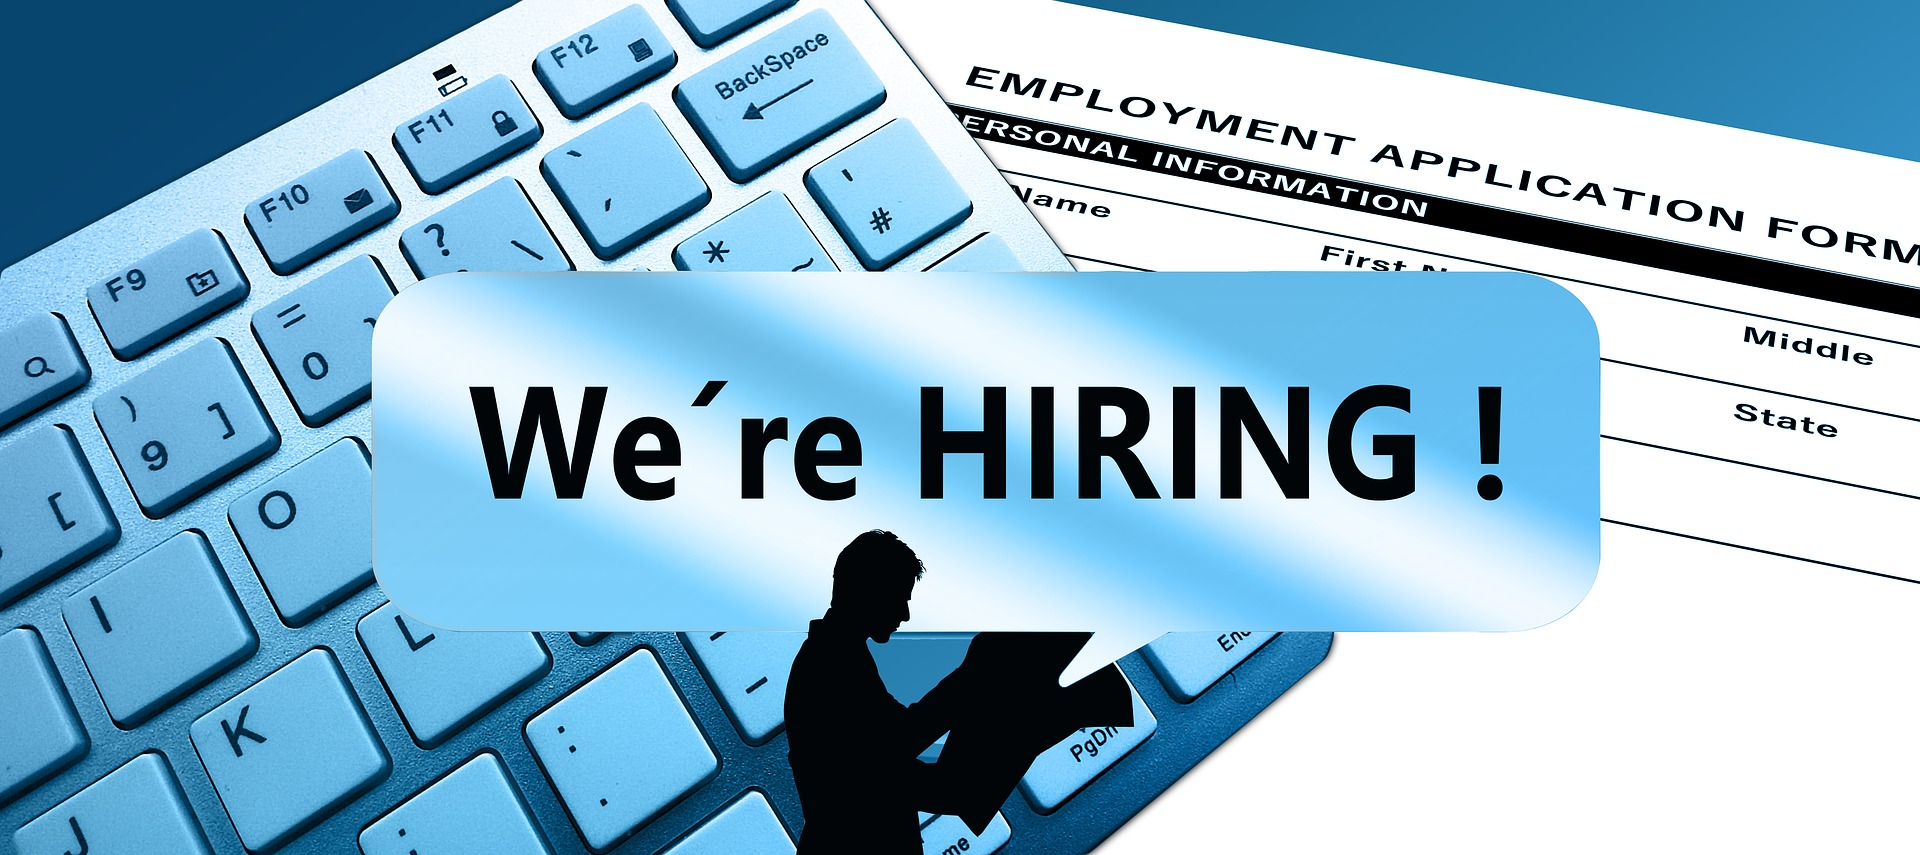 we're hiring, new job, job openings,